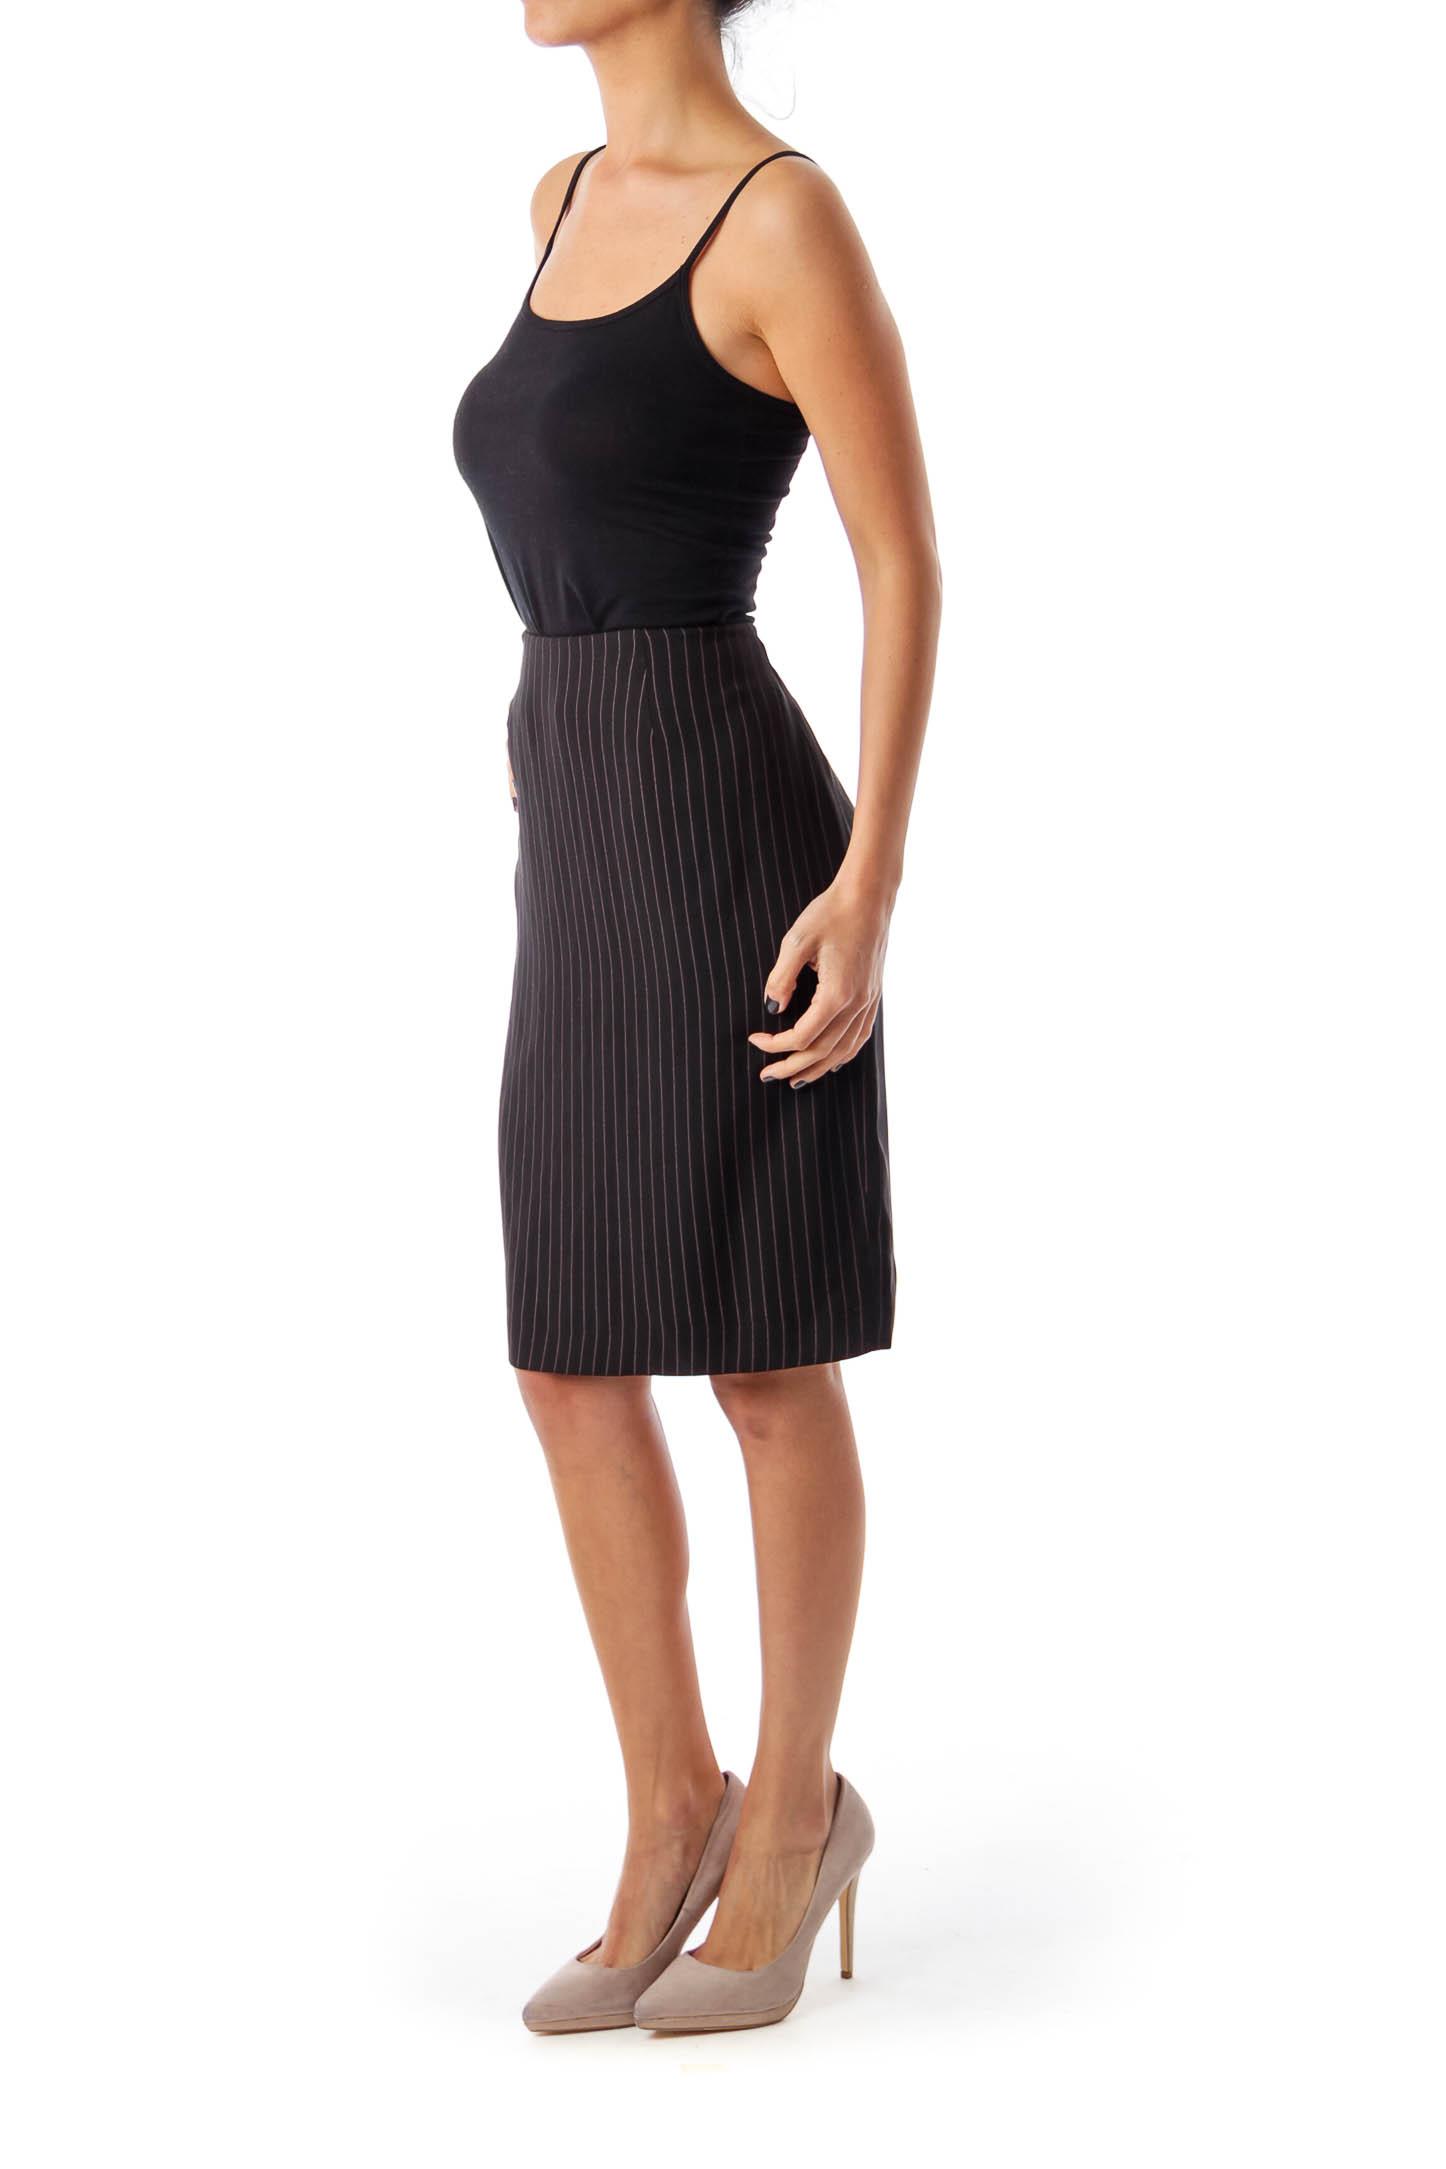 Black Stripe Pencil Skirt